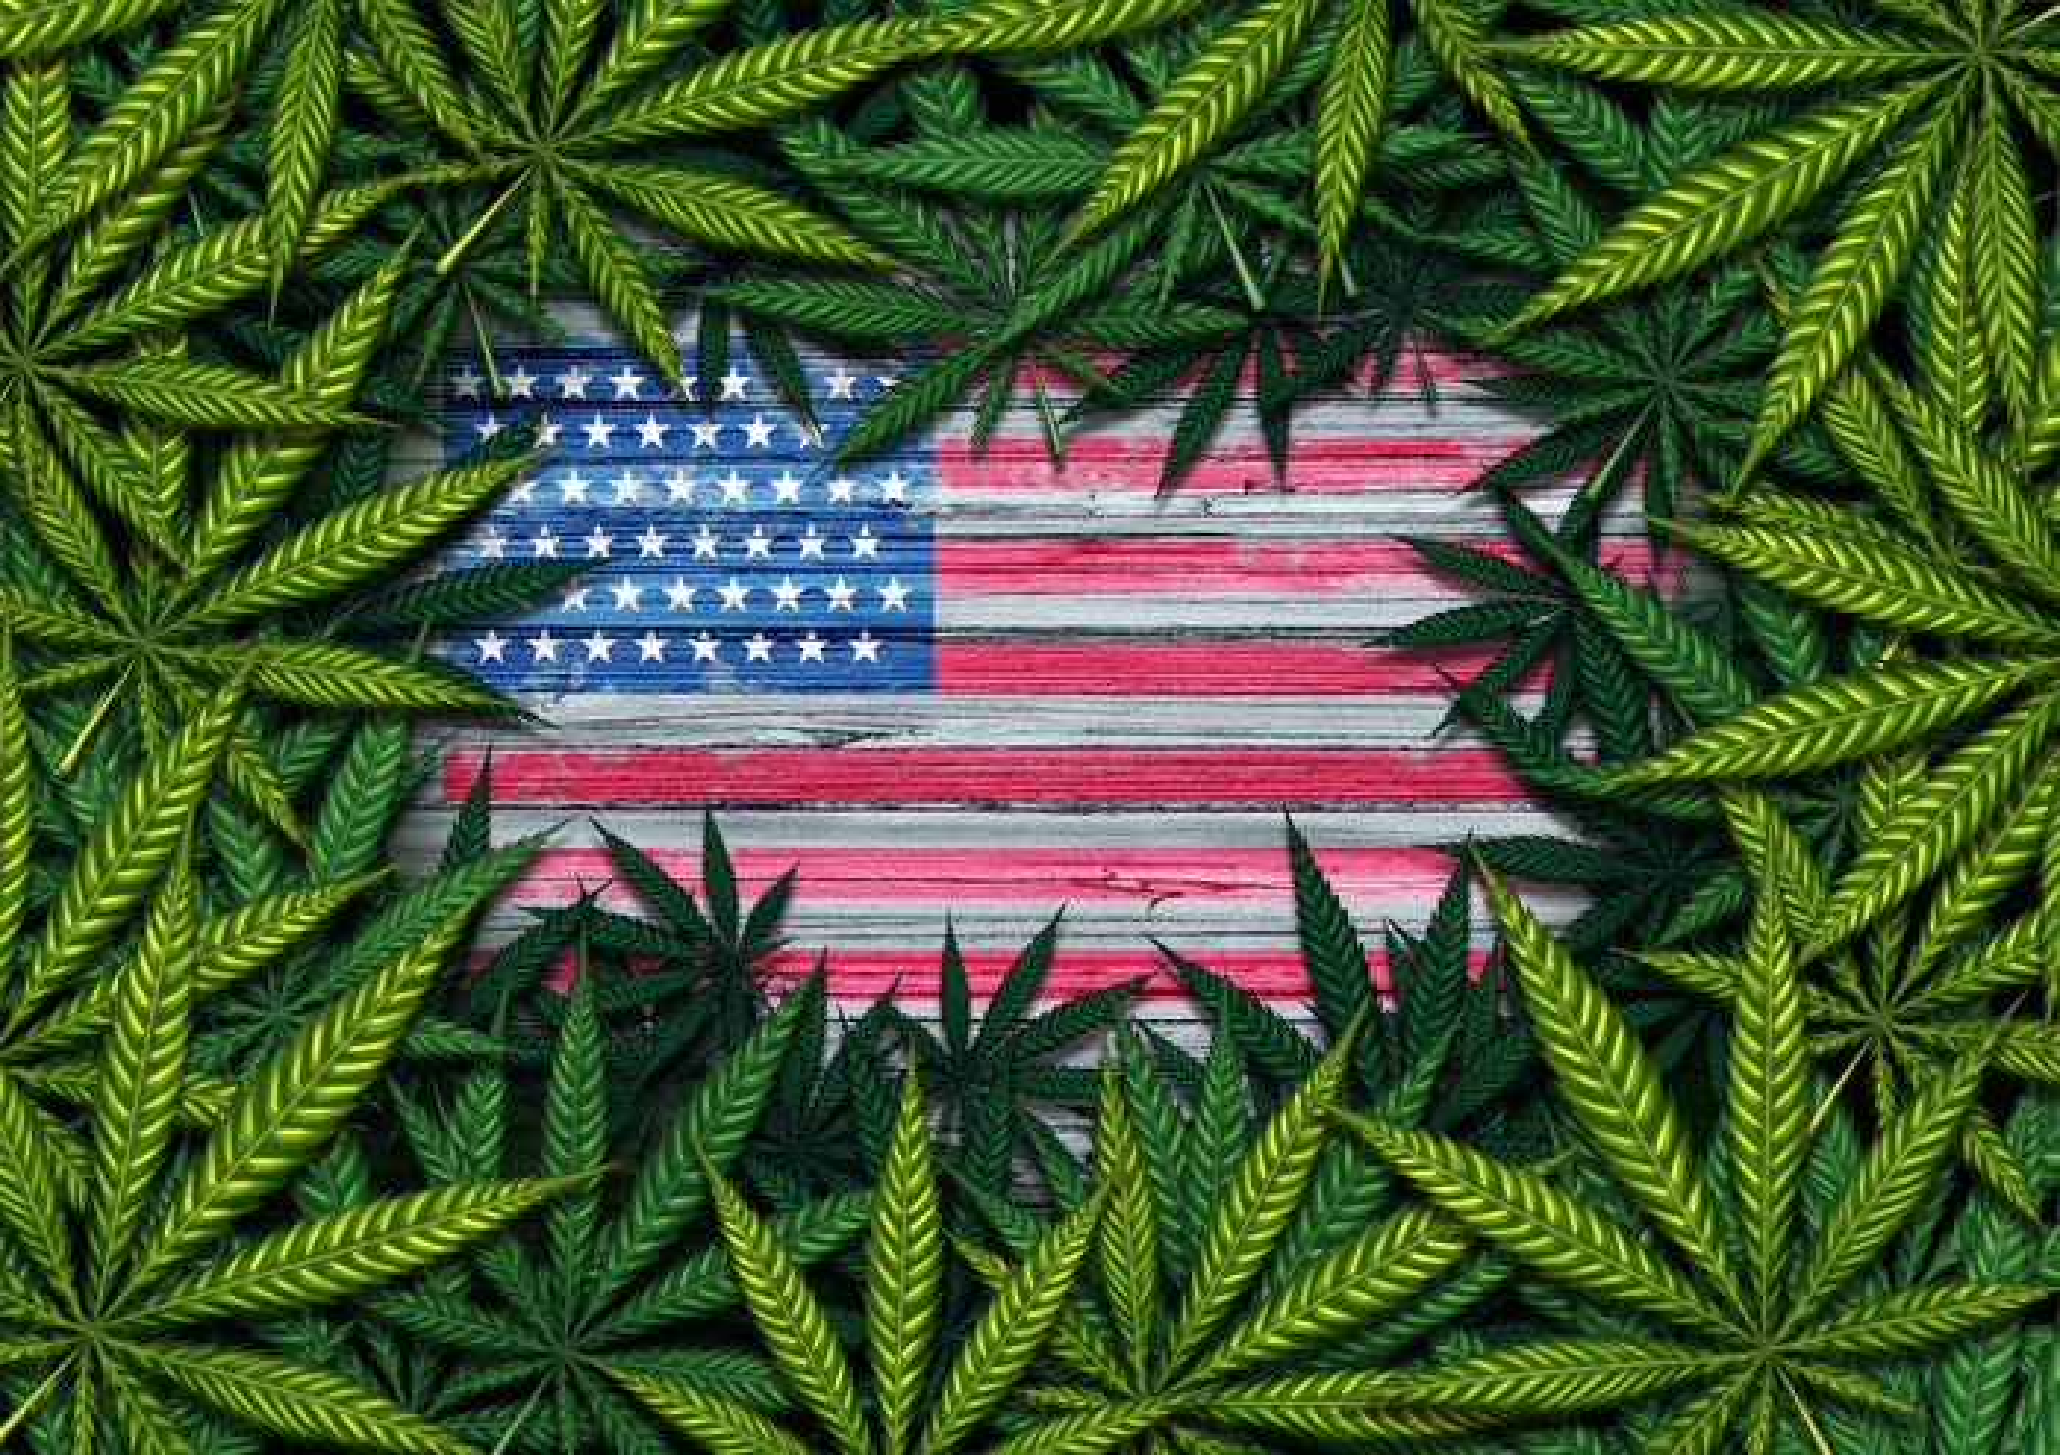 Rustic U.S. flag surrounded by marijuana leaves